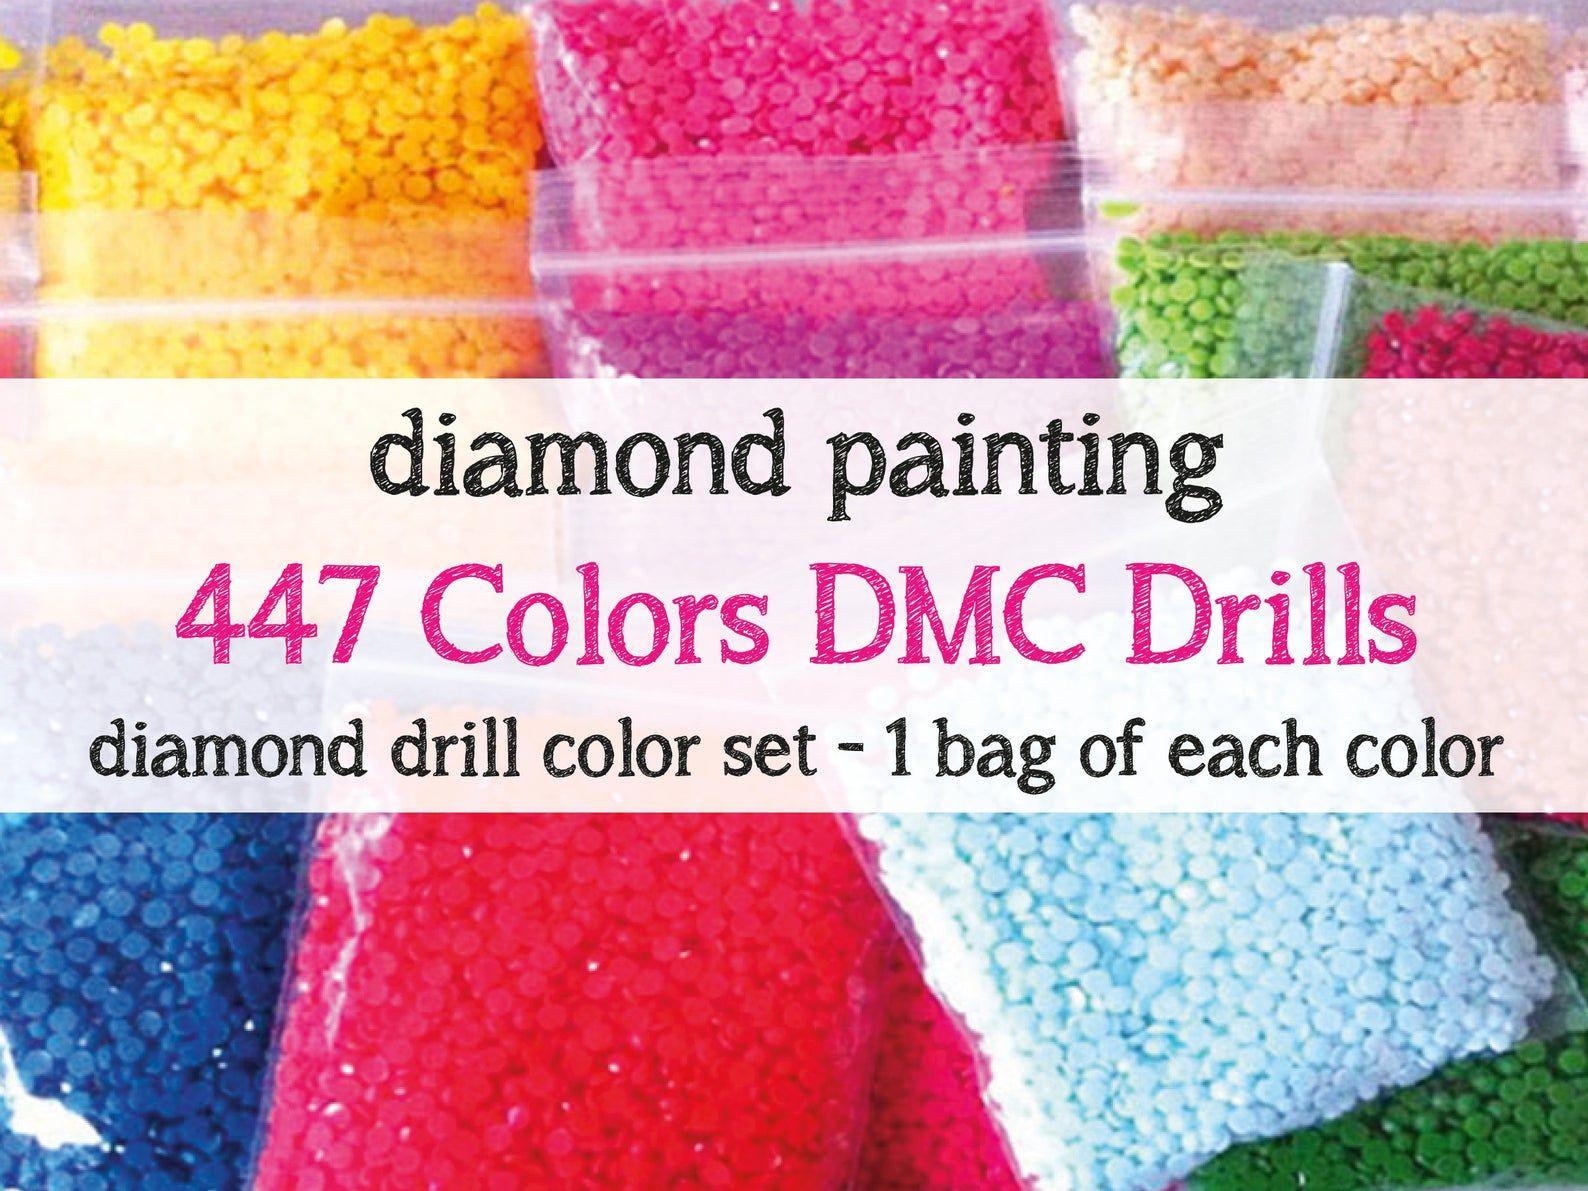 Diamond Painting SQUARE Resin Drills  FULL Set Square  Complete Set Drills  Resin Drills  Diamond Painting Accessories  USA Shipper